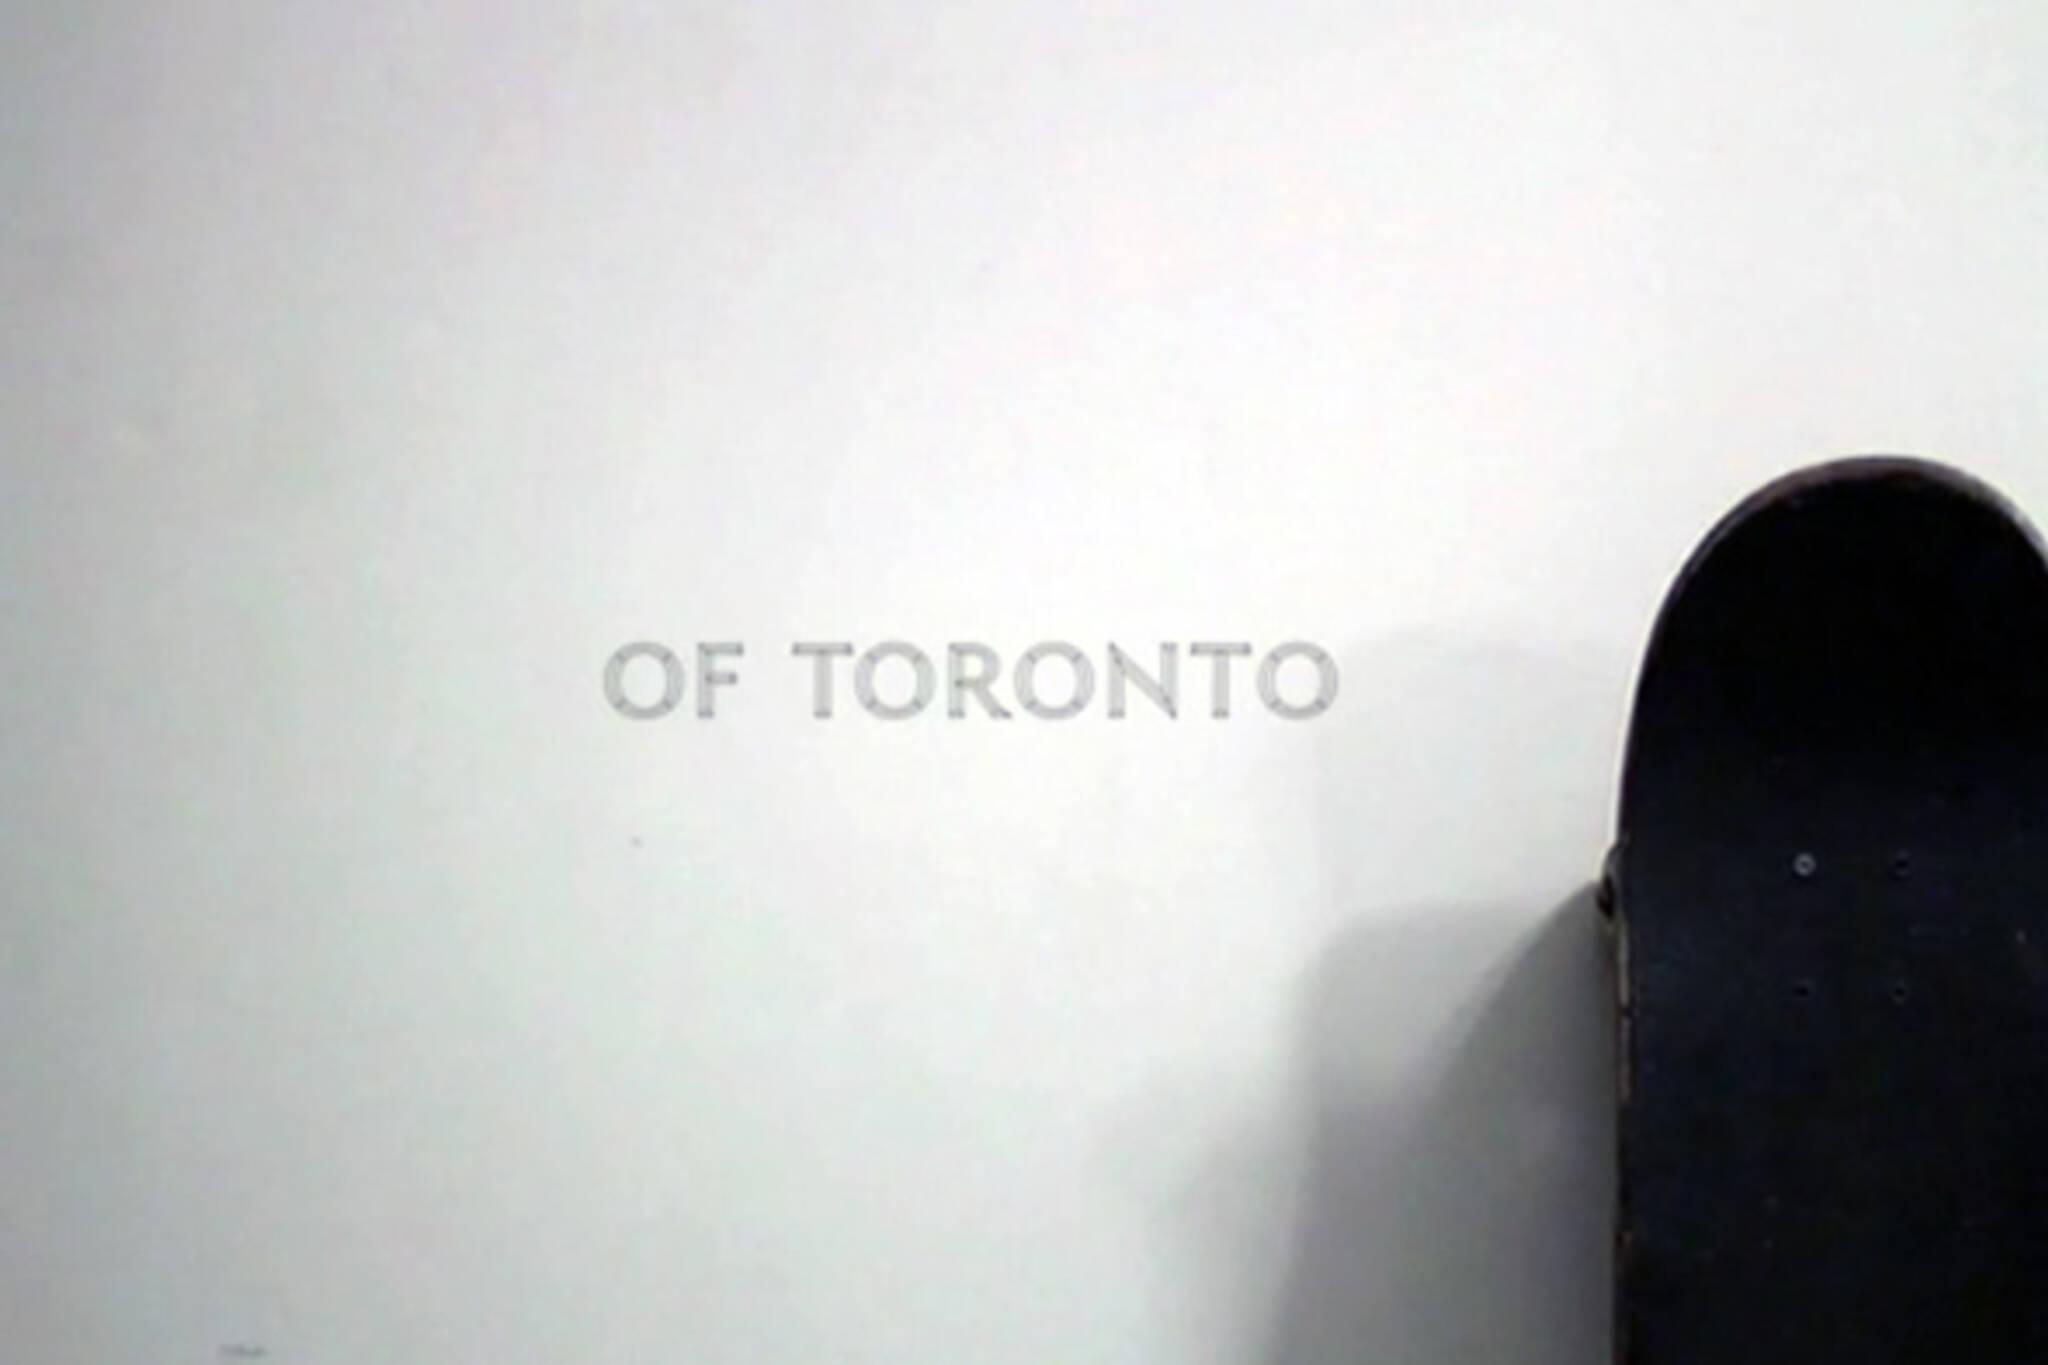 Of Toronto